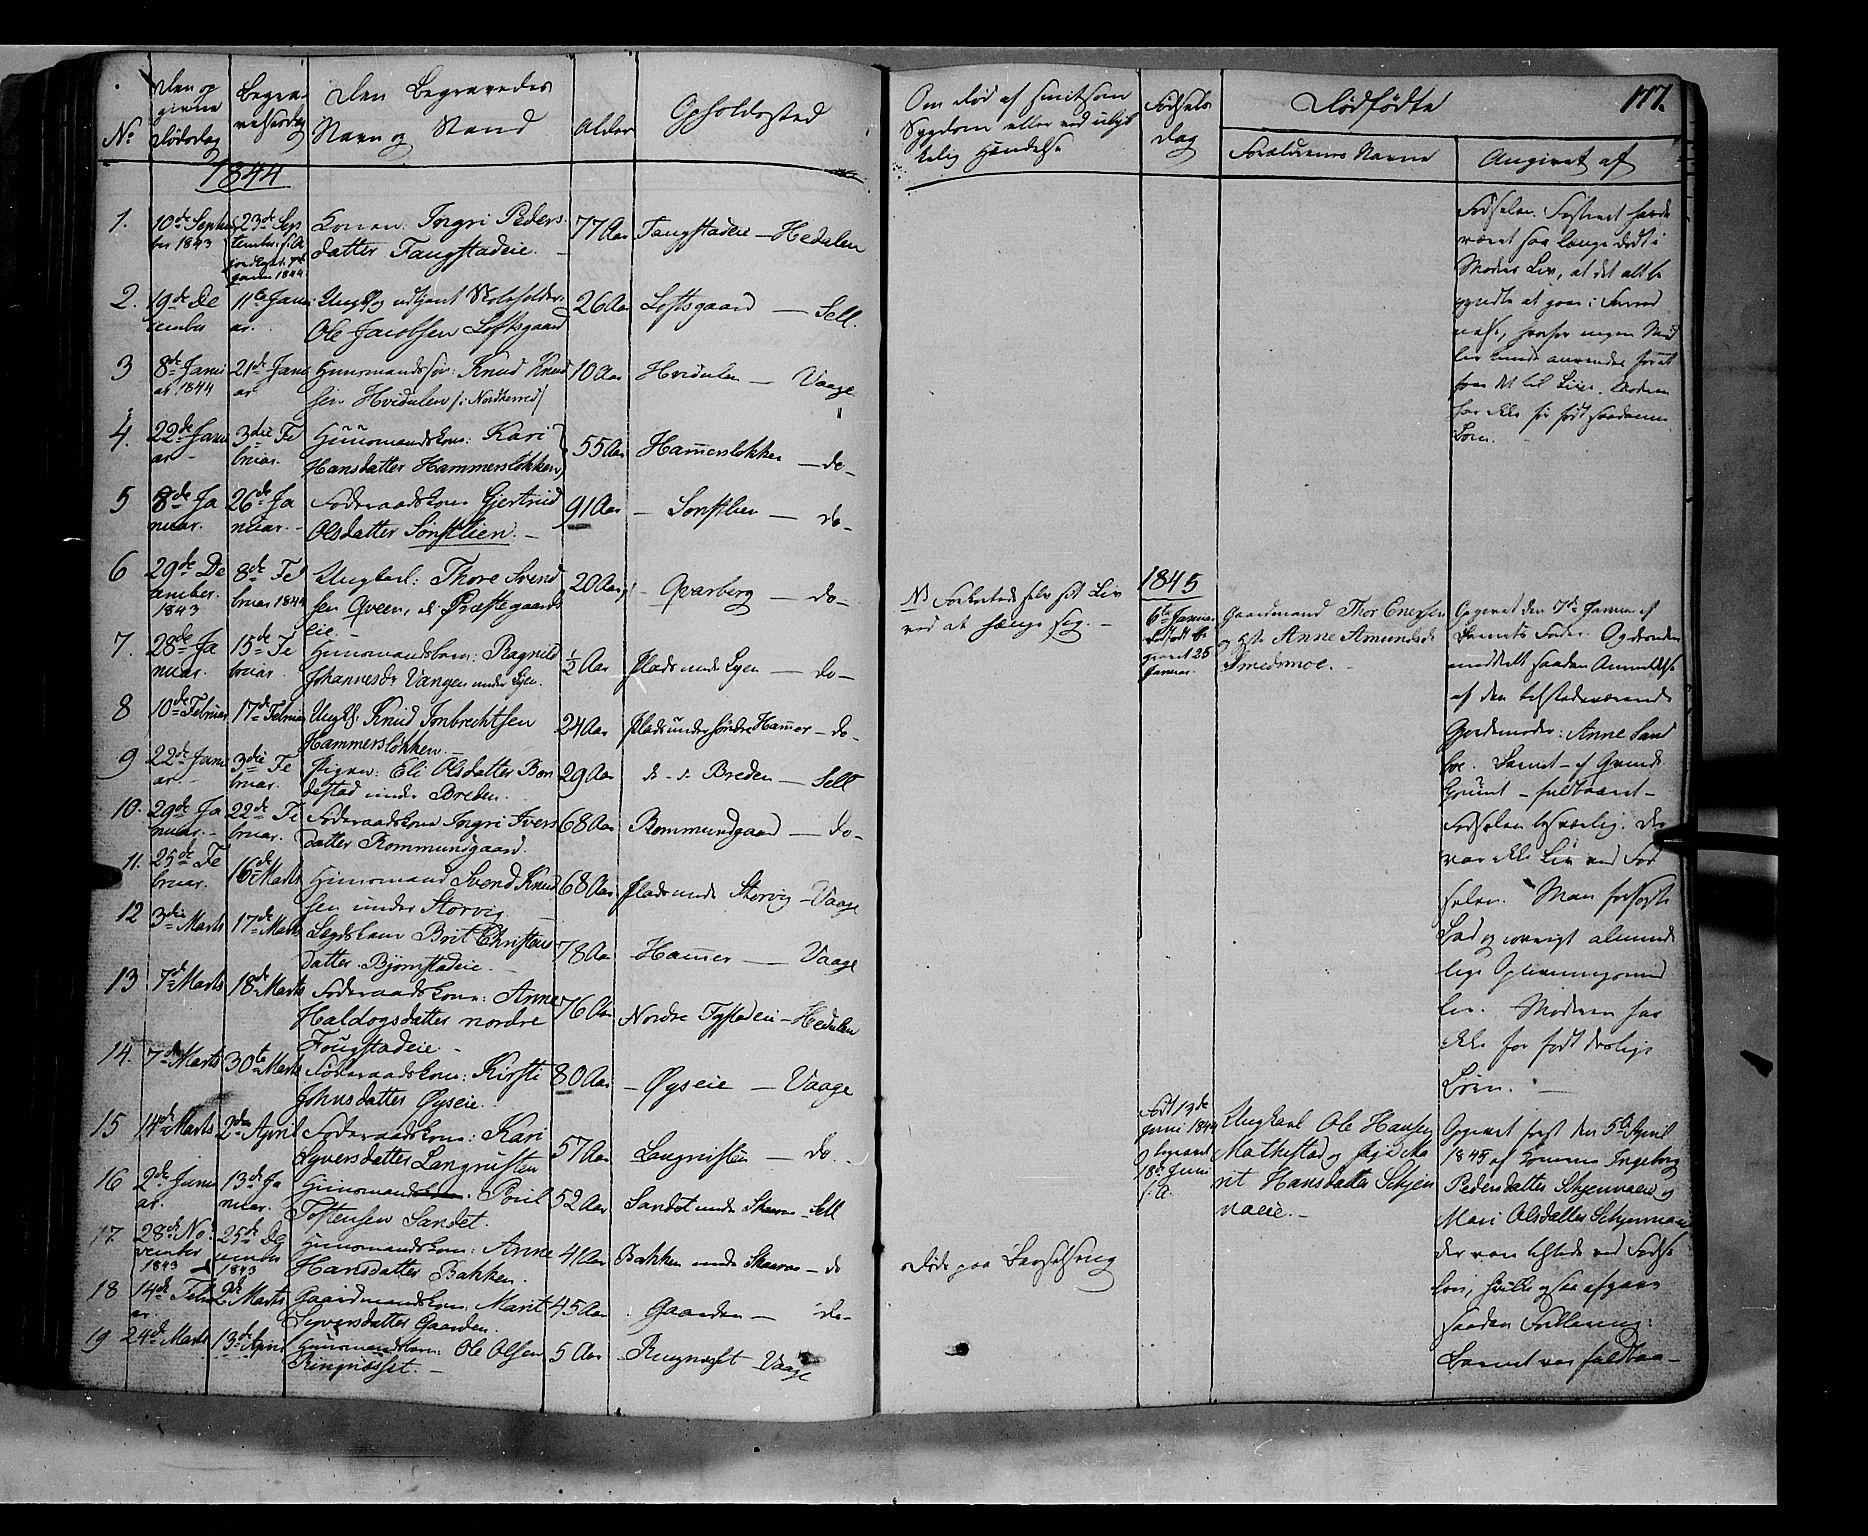 SAH, Vågå prestekontor, Ministerialbok nr. 5 /1, 1842-1856, s. 177